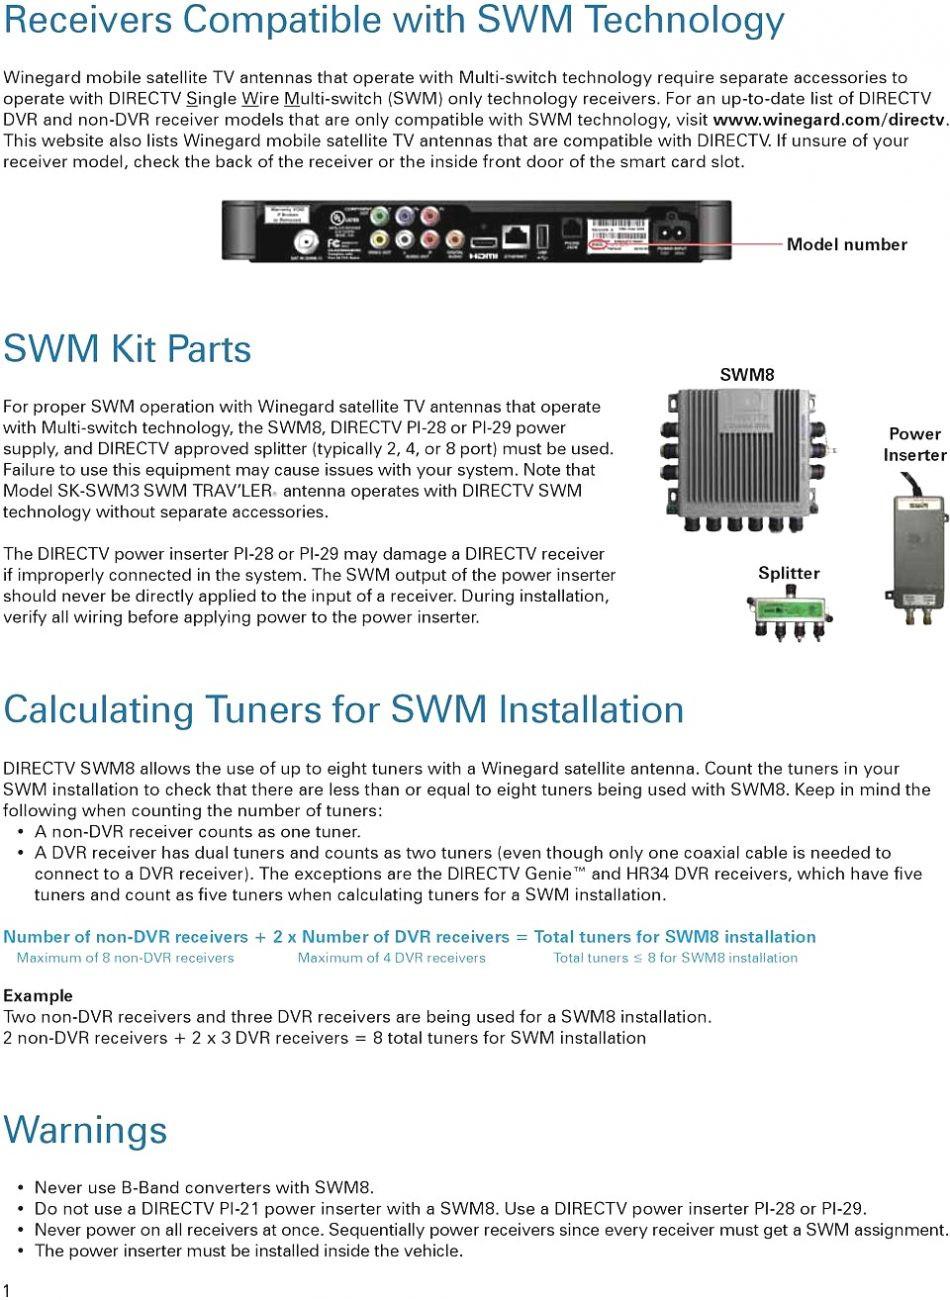 medium resolution of single wire multiswitch diagram wiring diagram directv swm 8 wiring diagram